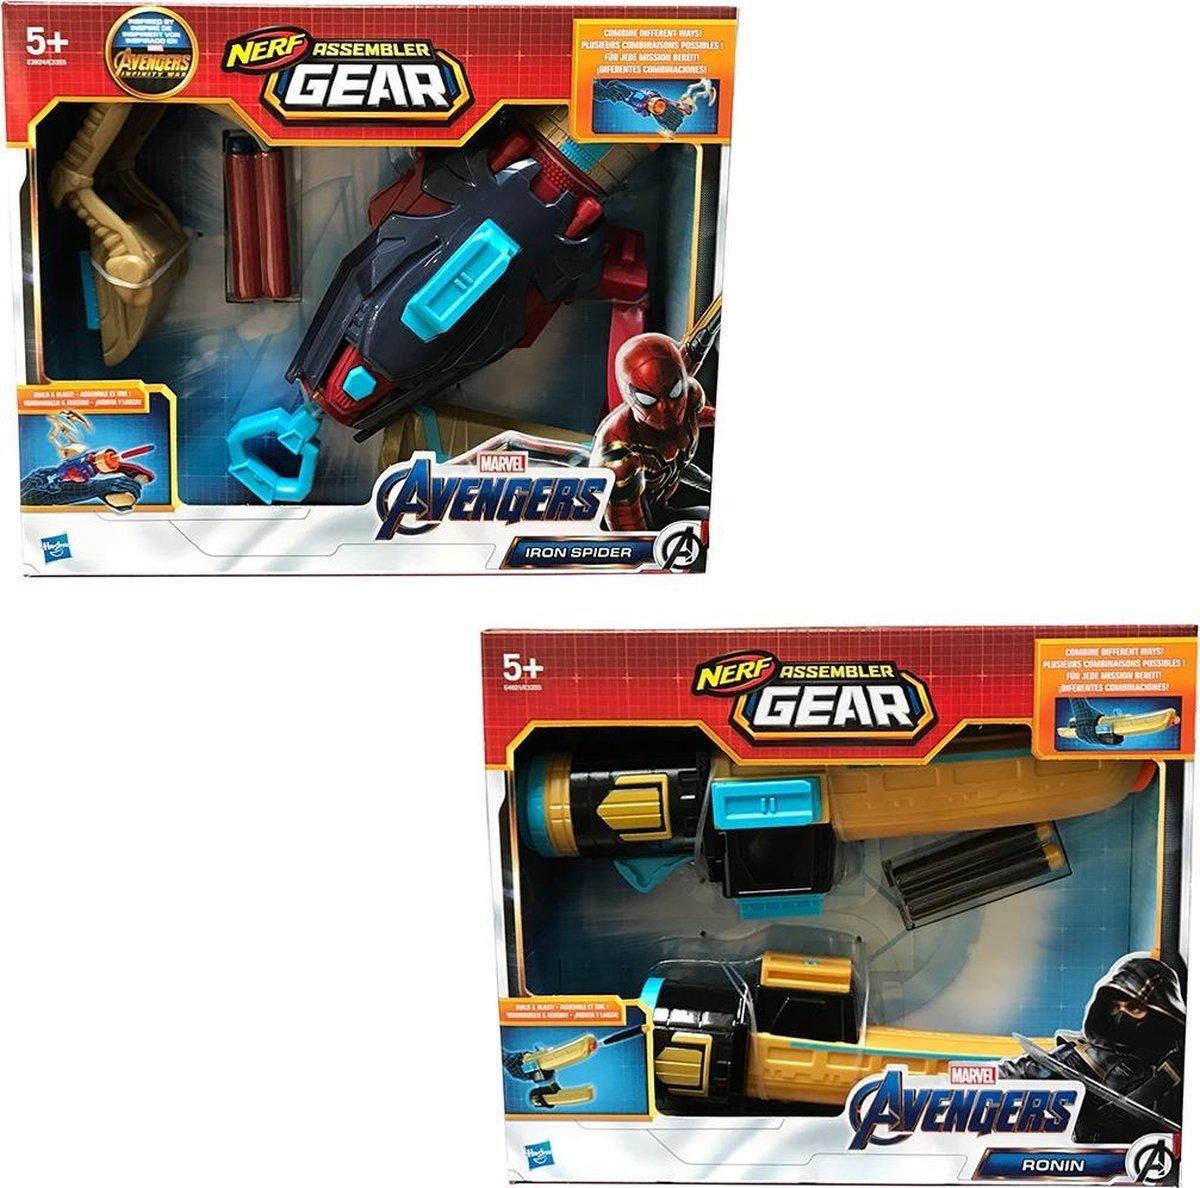 Nerf Assembler Gear Marvel Avengers Assorti